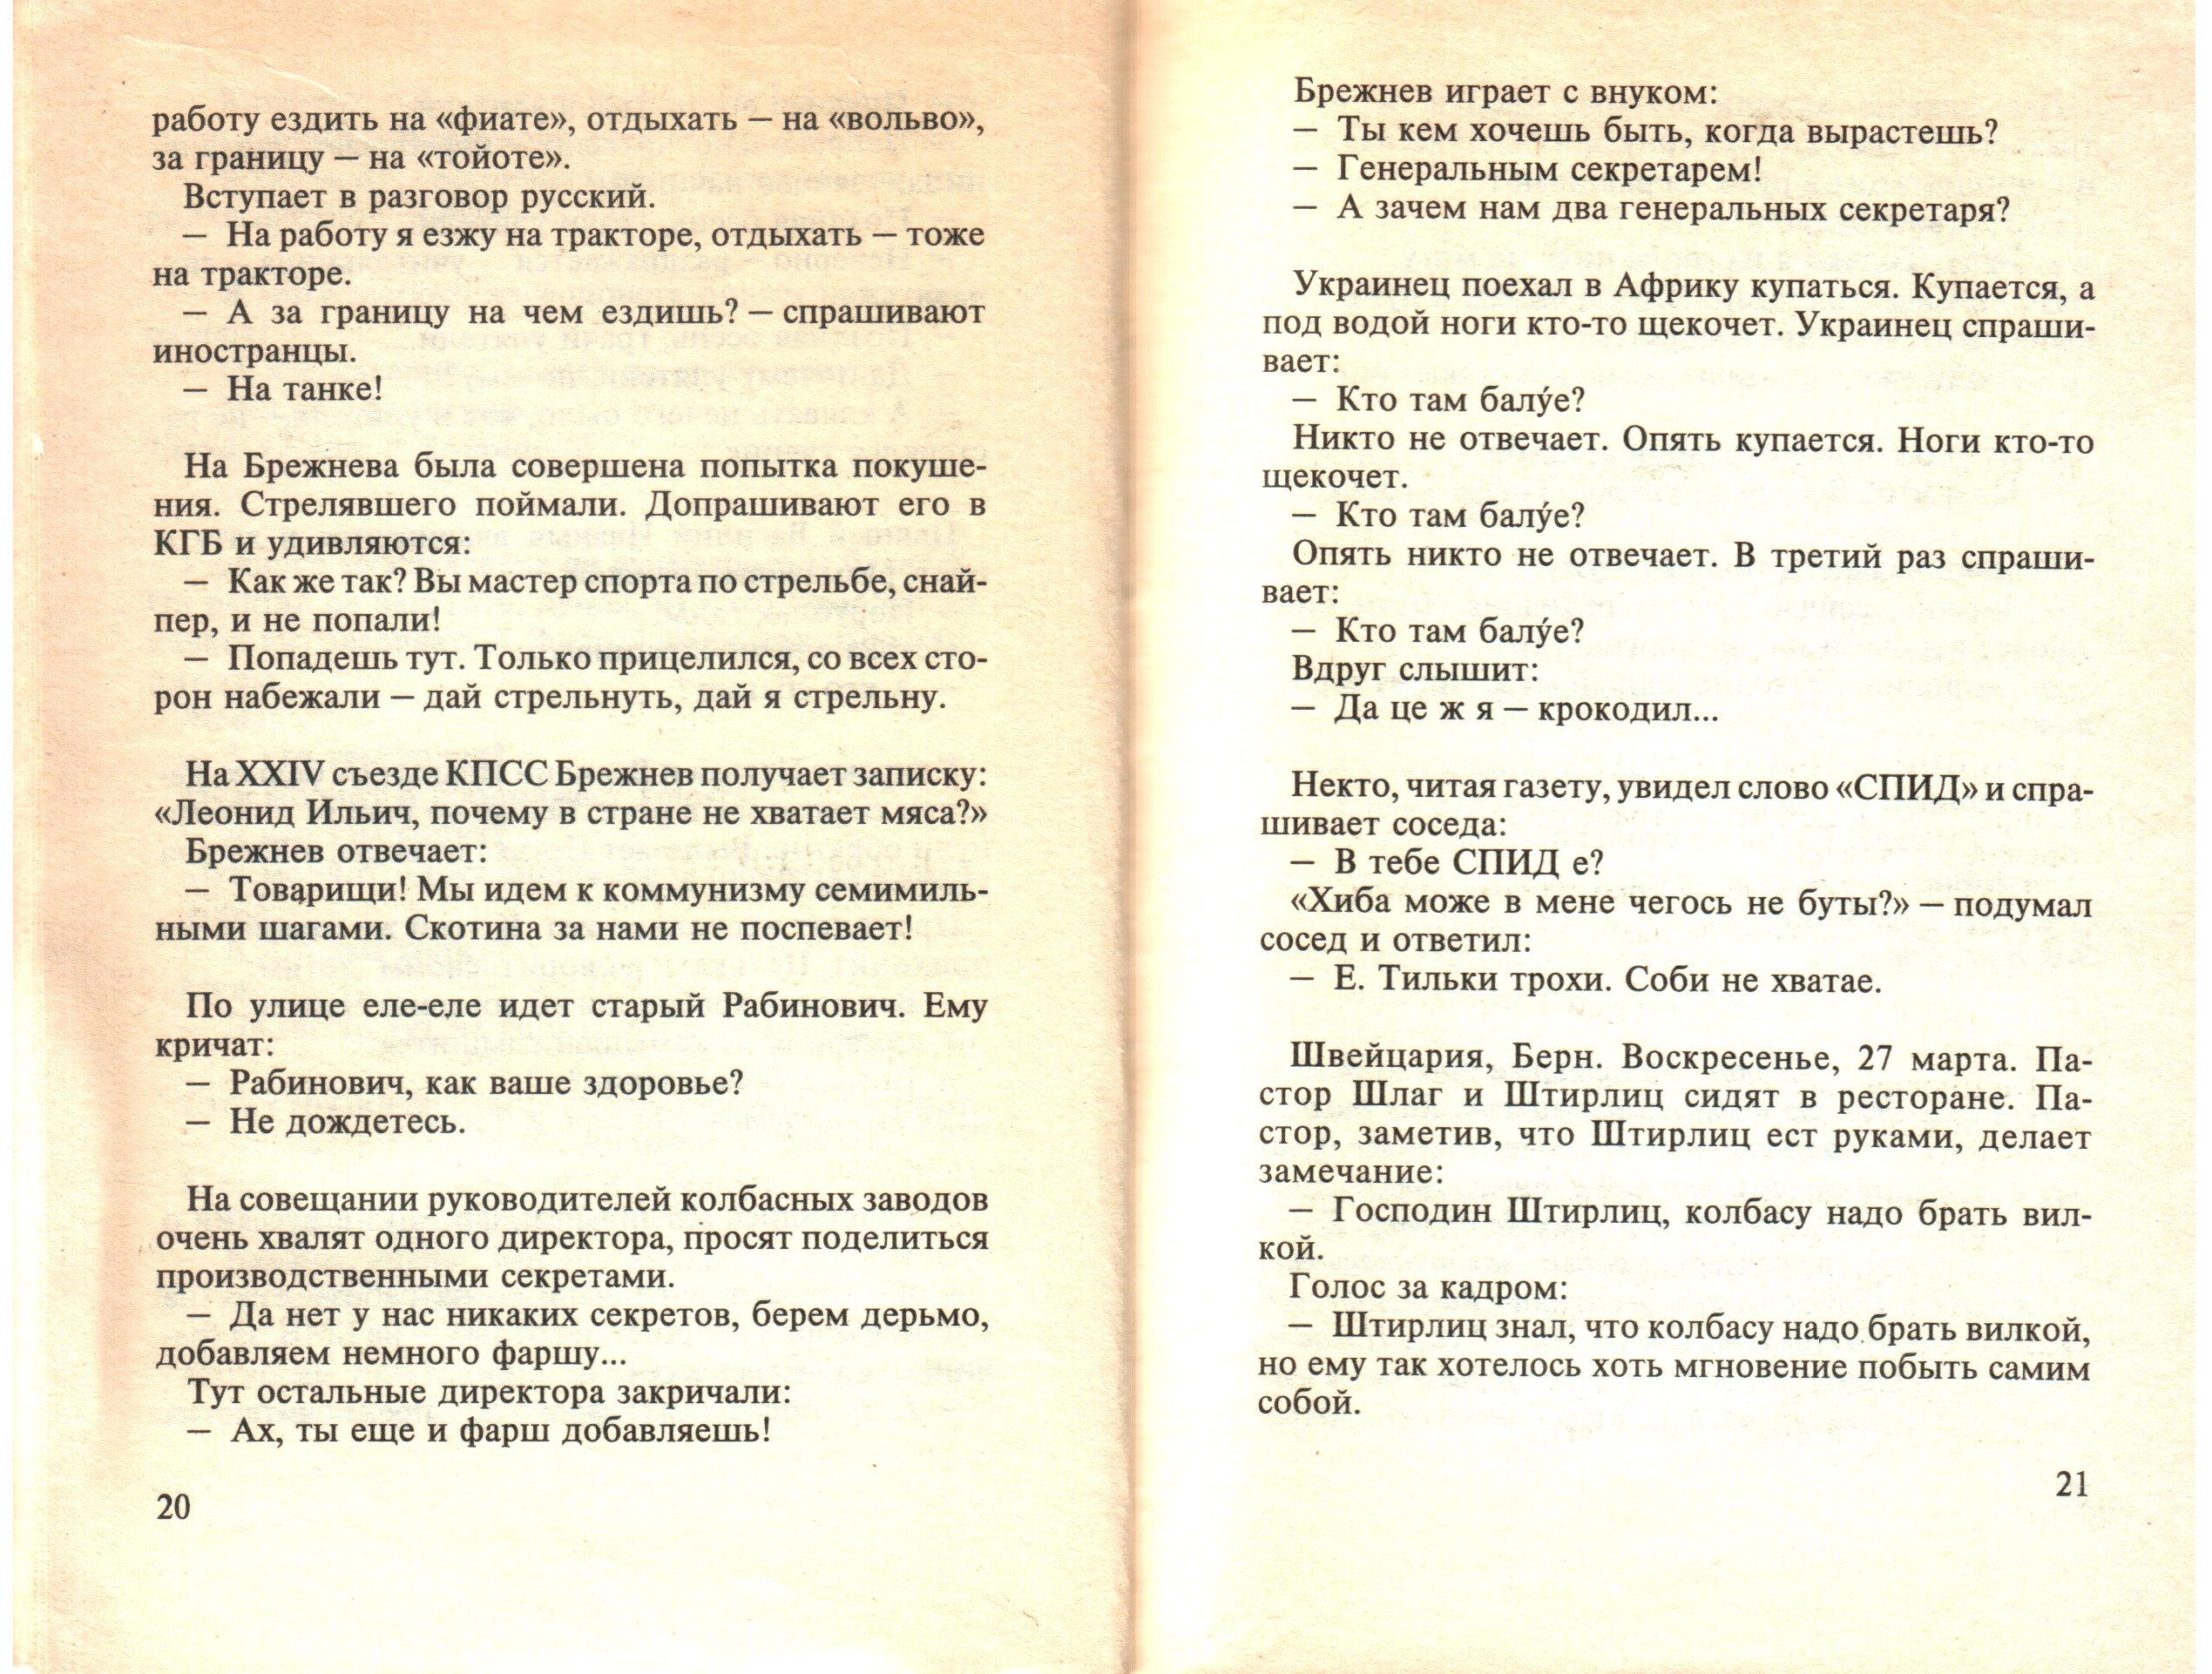 p20-21.jpg